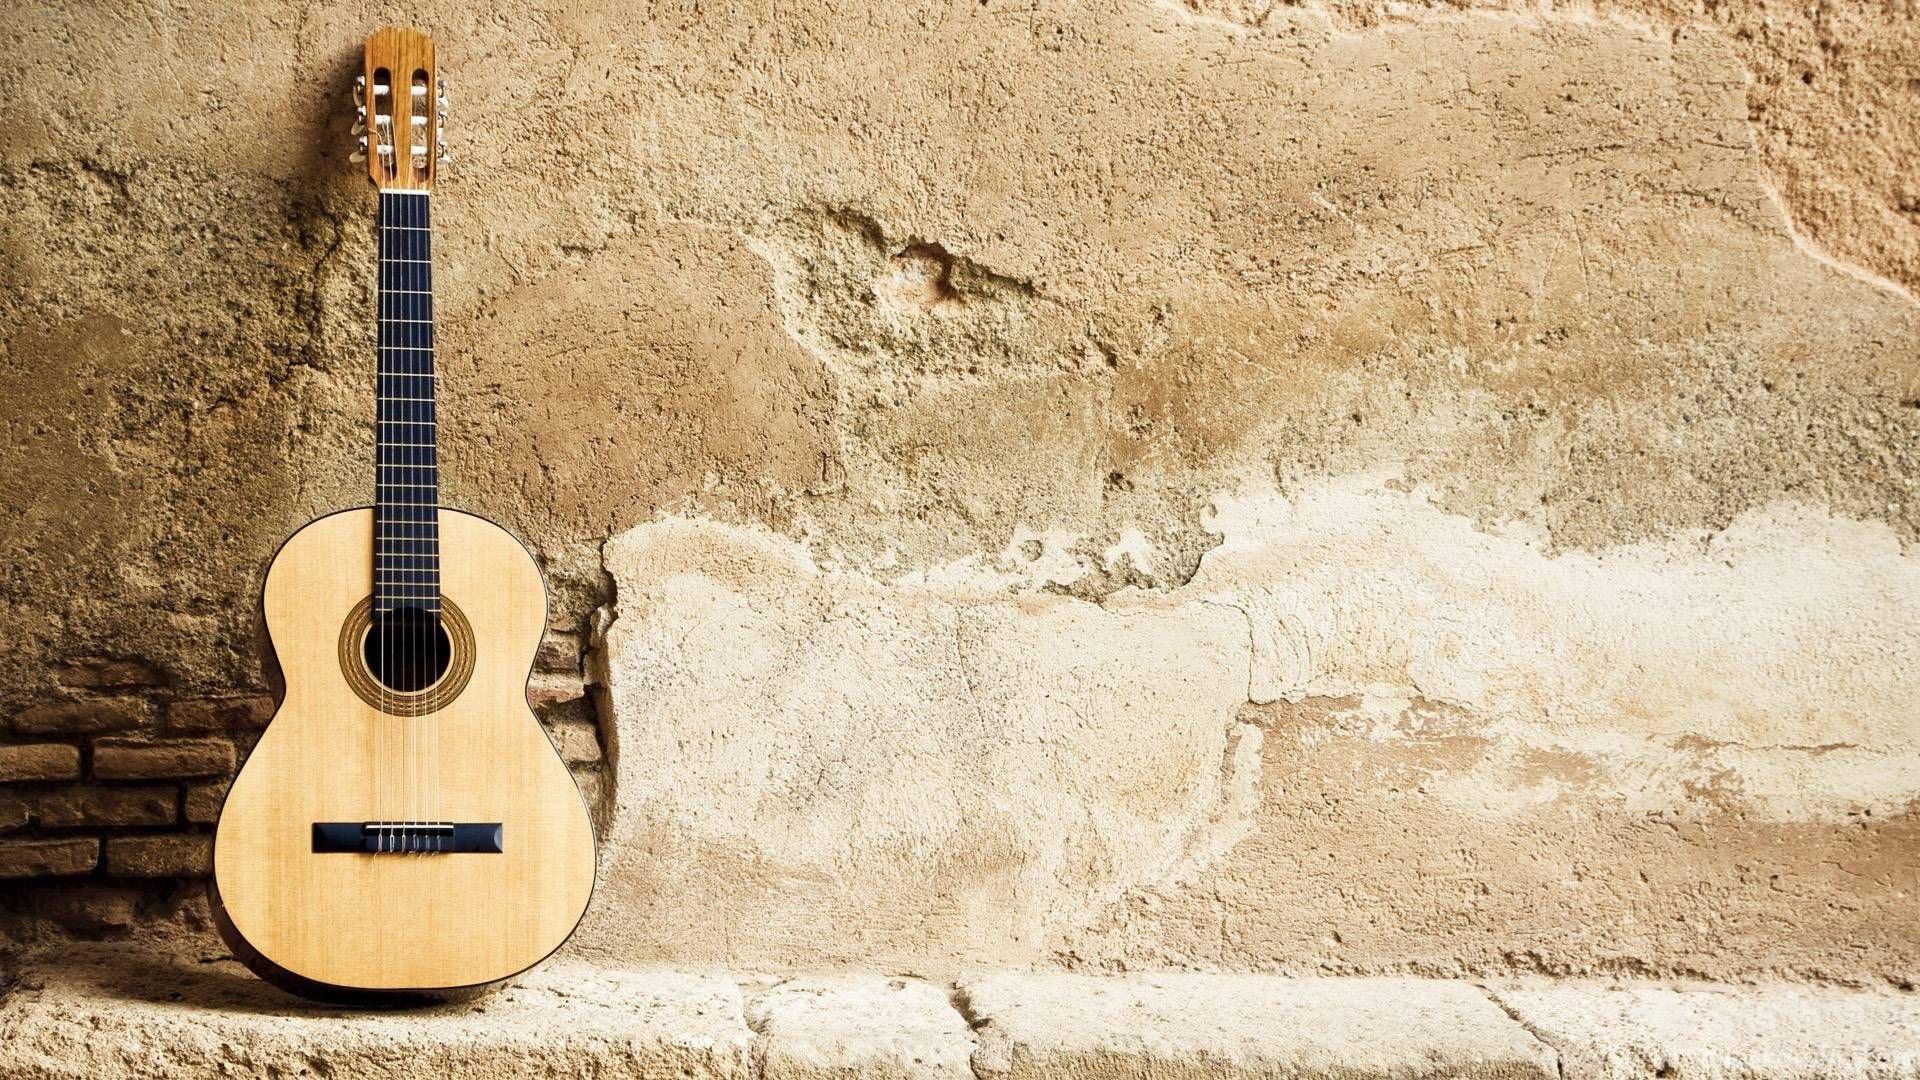 Wonderful Wallpaper Home Screen Guitar - 45633_acoustic-guitar-wallpapers-hd-resolution_1920x1080_h  Picture_585.jpg